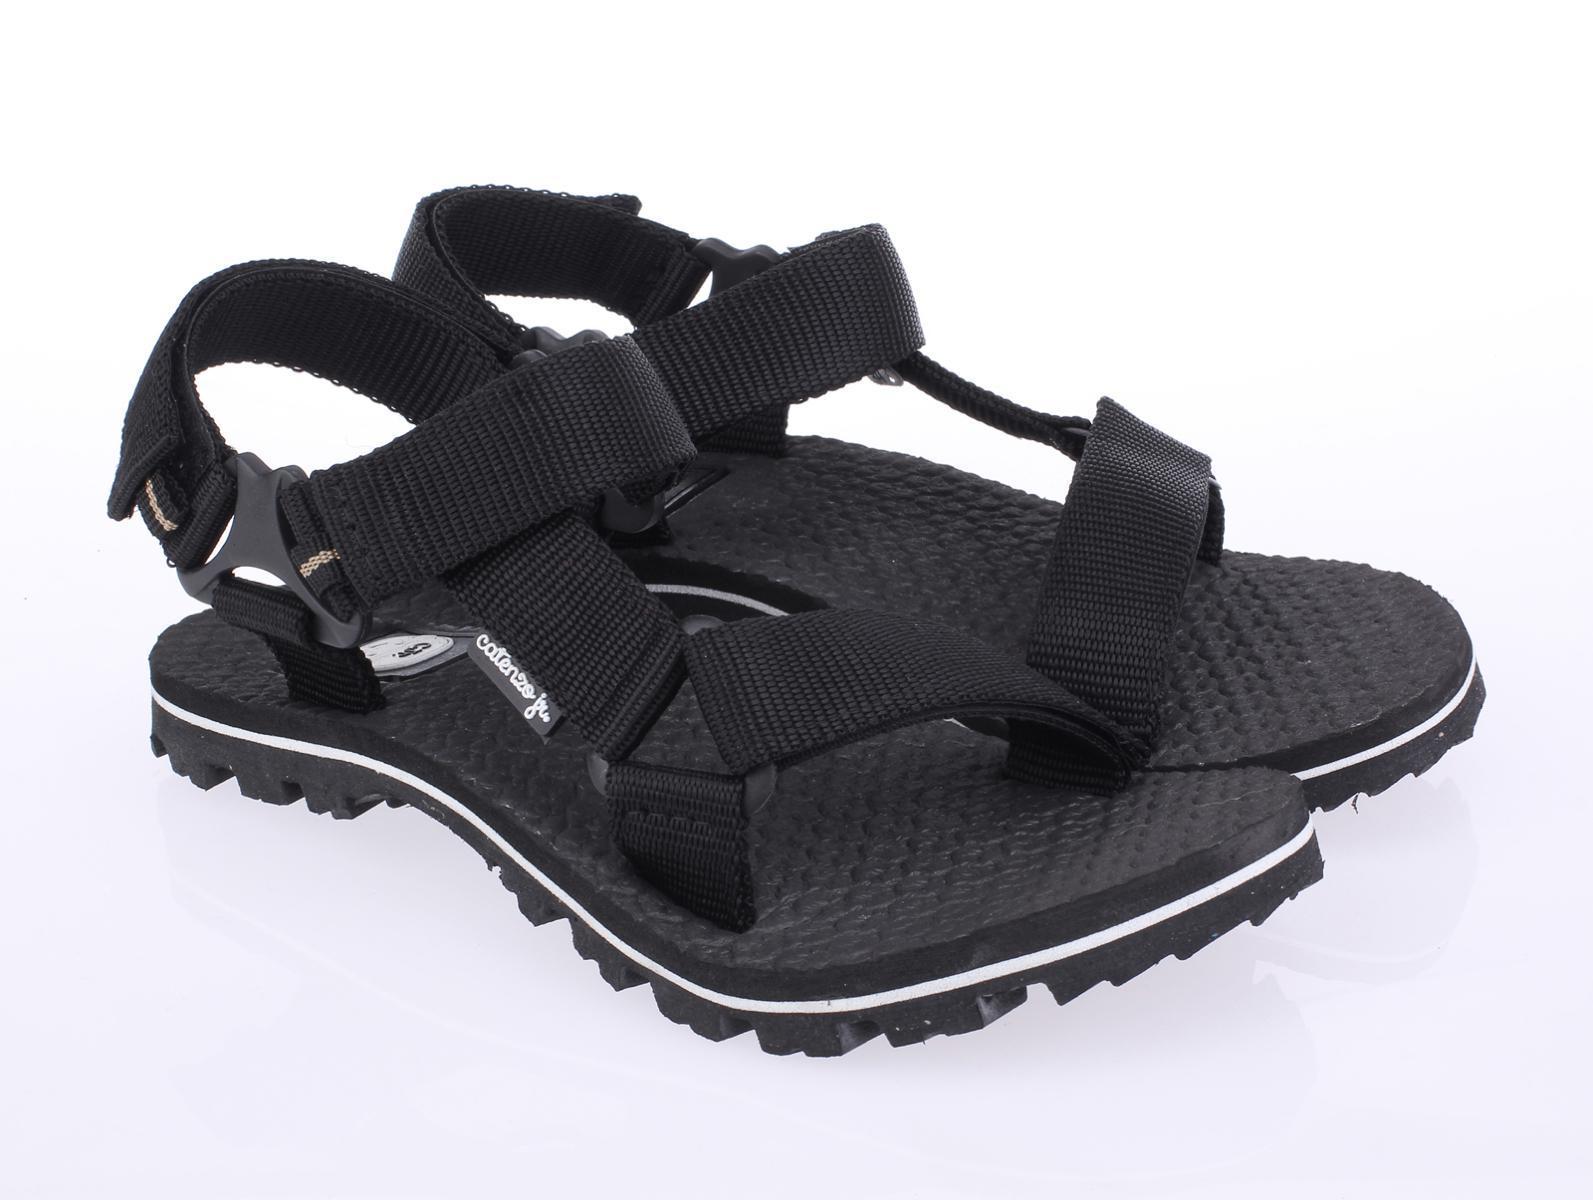 Catenzo Junior Sandal Gunung Anak Quailava Cjj 002 Merah Daftar Sepatu Jhc02 Jpc01 Htm 2 Psg